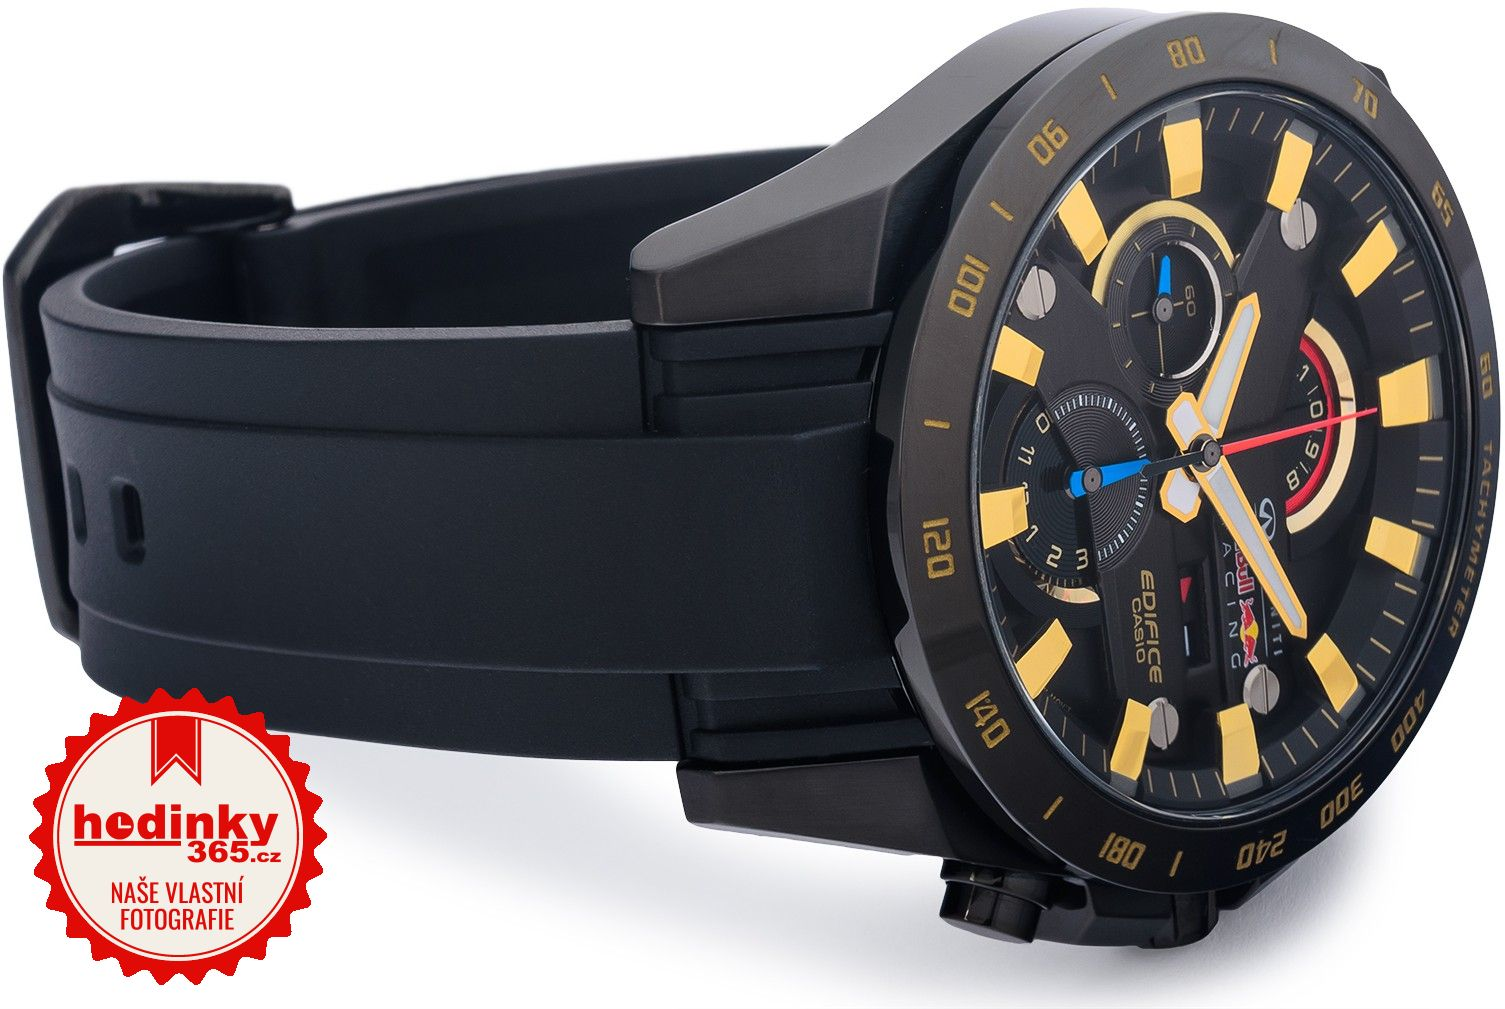 Casio Edifice EFR-540RBP-1AER Infiniti Red Bull Racing Limited Edition. Pánské  hodinky - pryskyřicový řemínek 0c4f6e17f7